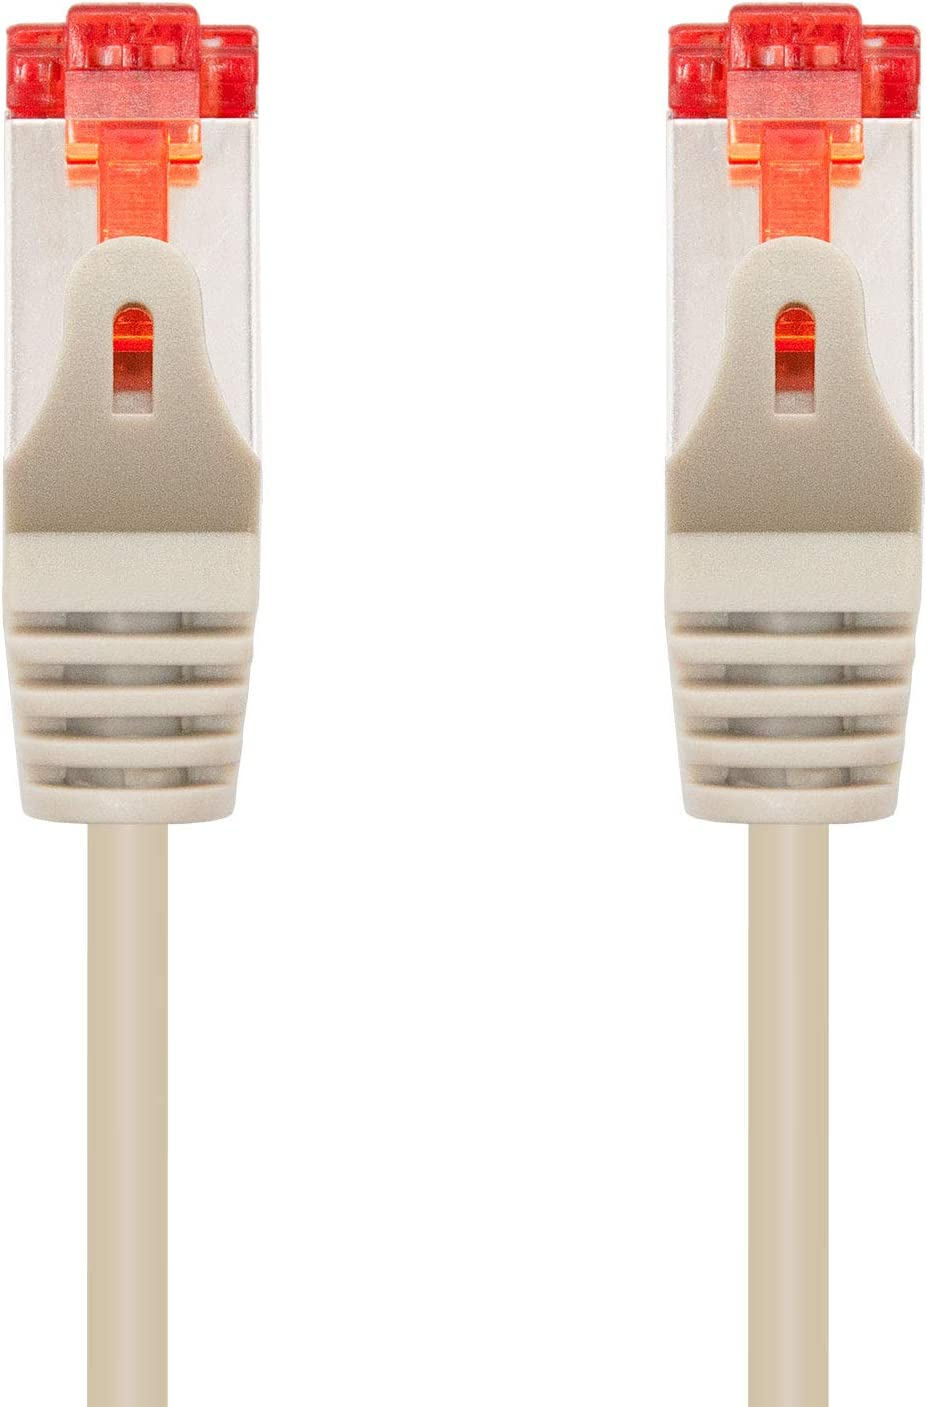 GRIS Catchphrase 7/MTS 6/SSTP PIMF Flexible AWG26 NANOCABLE 10.20.1207/ /Ethernet Network Cable RJ45/Cat